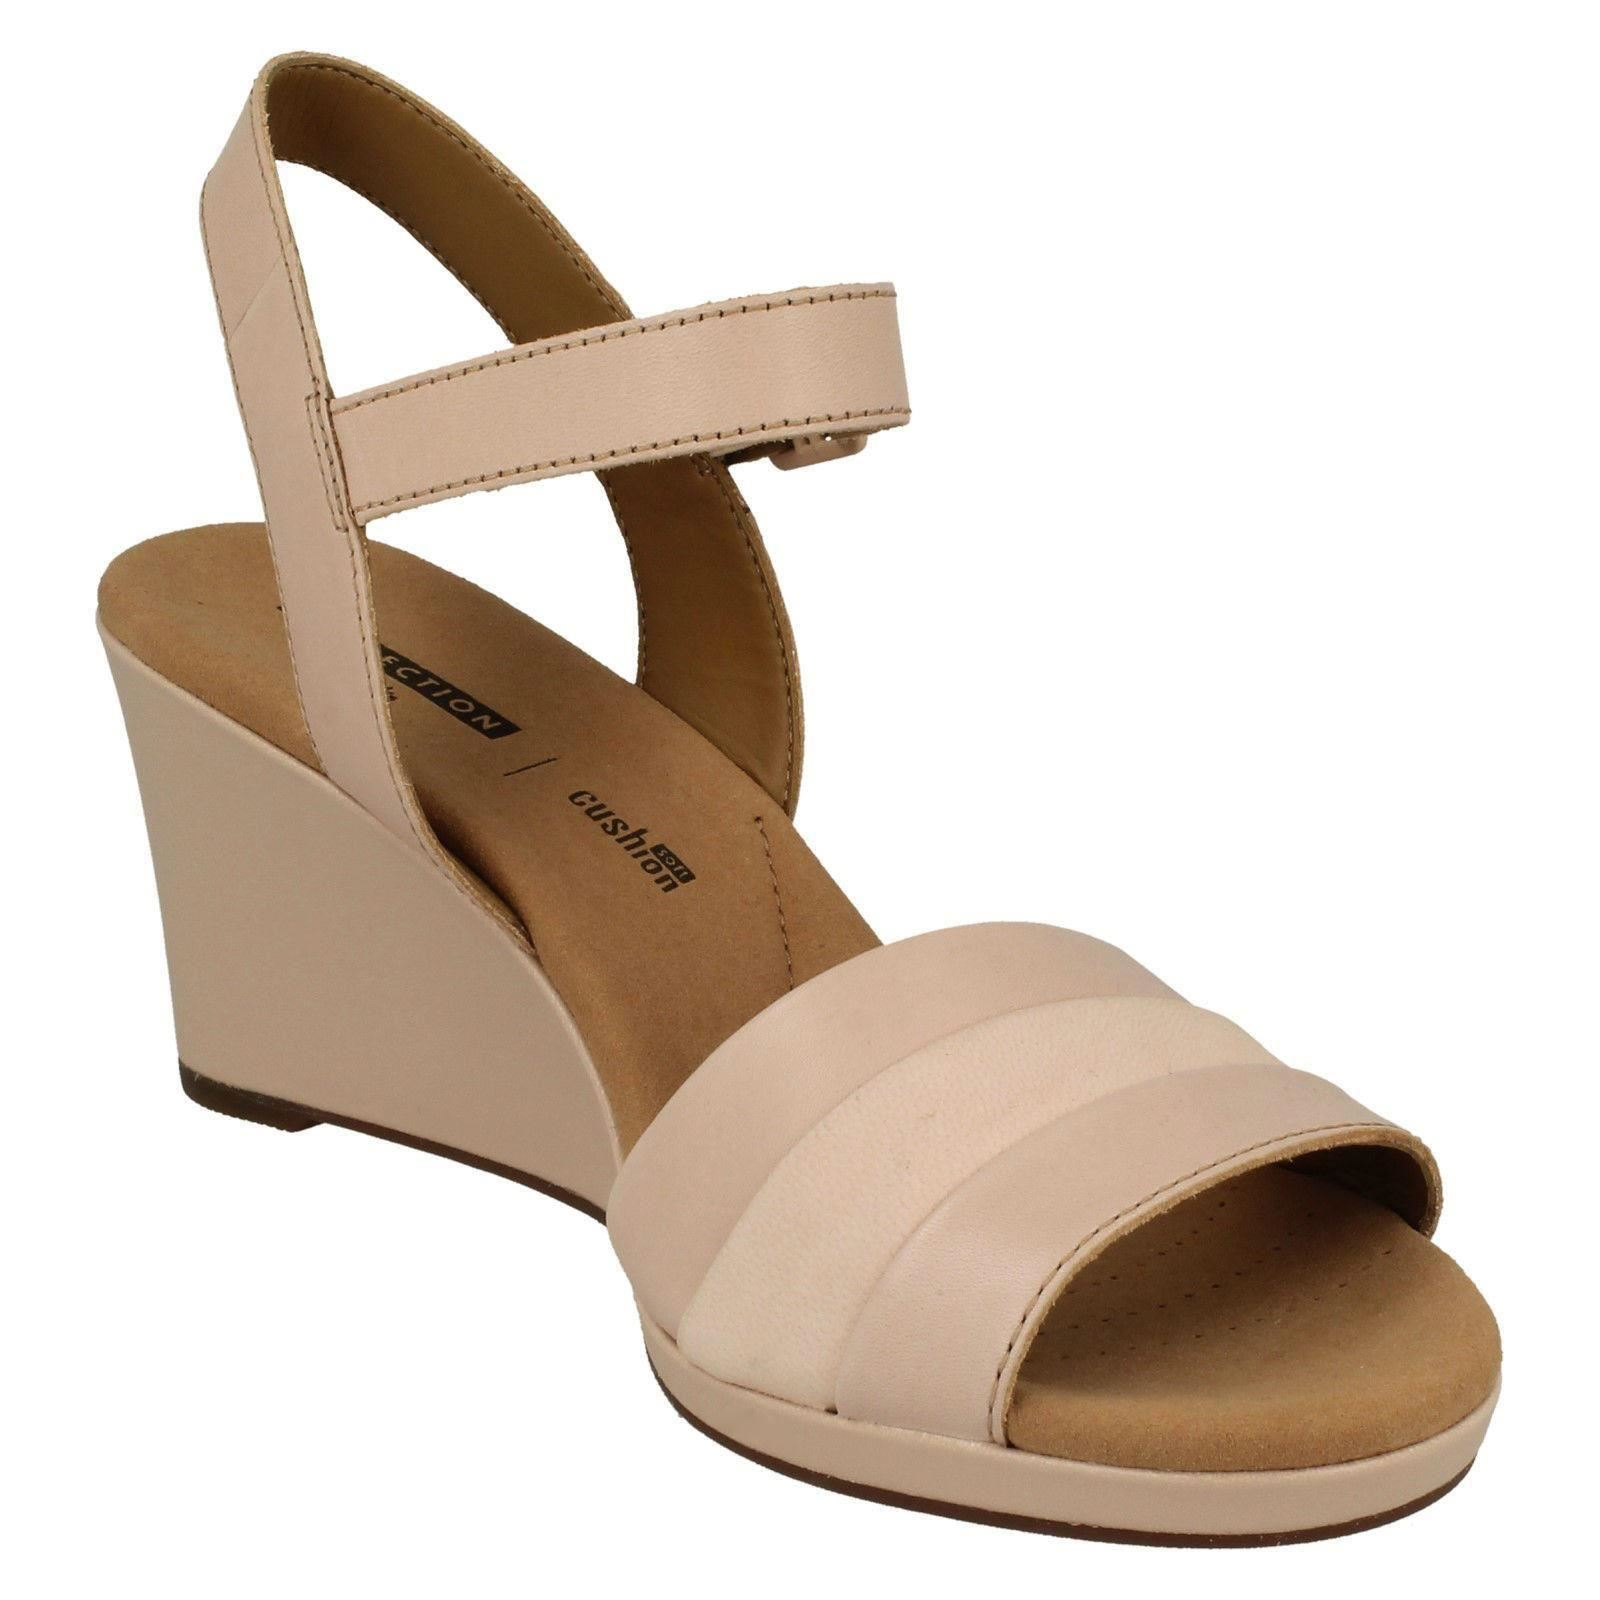 Damenschuhe Clarks Wedged Heel Sandales Sandales Sandales Lafley Aletha 2ca57b